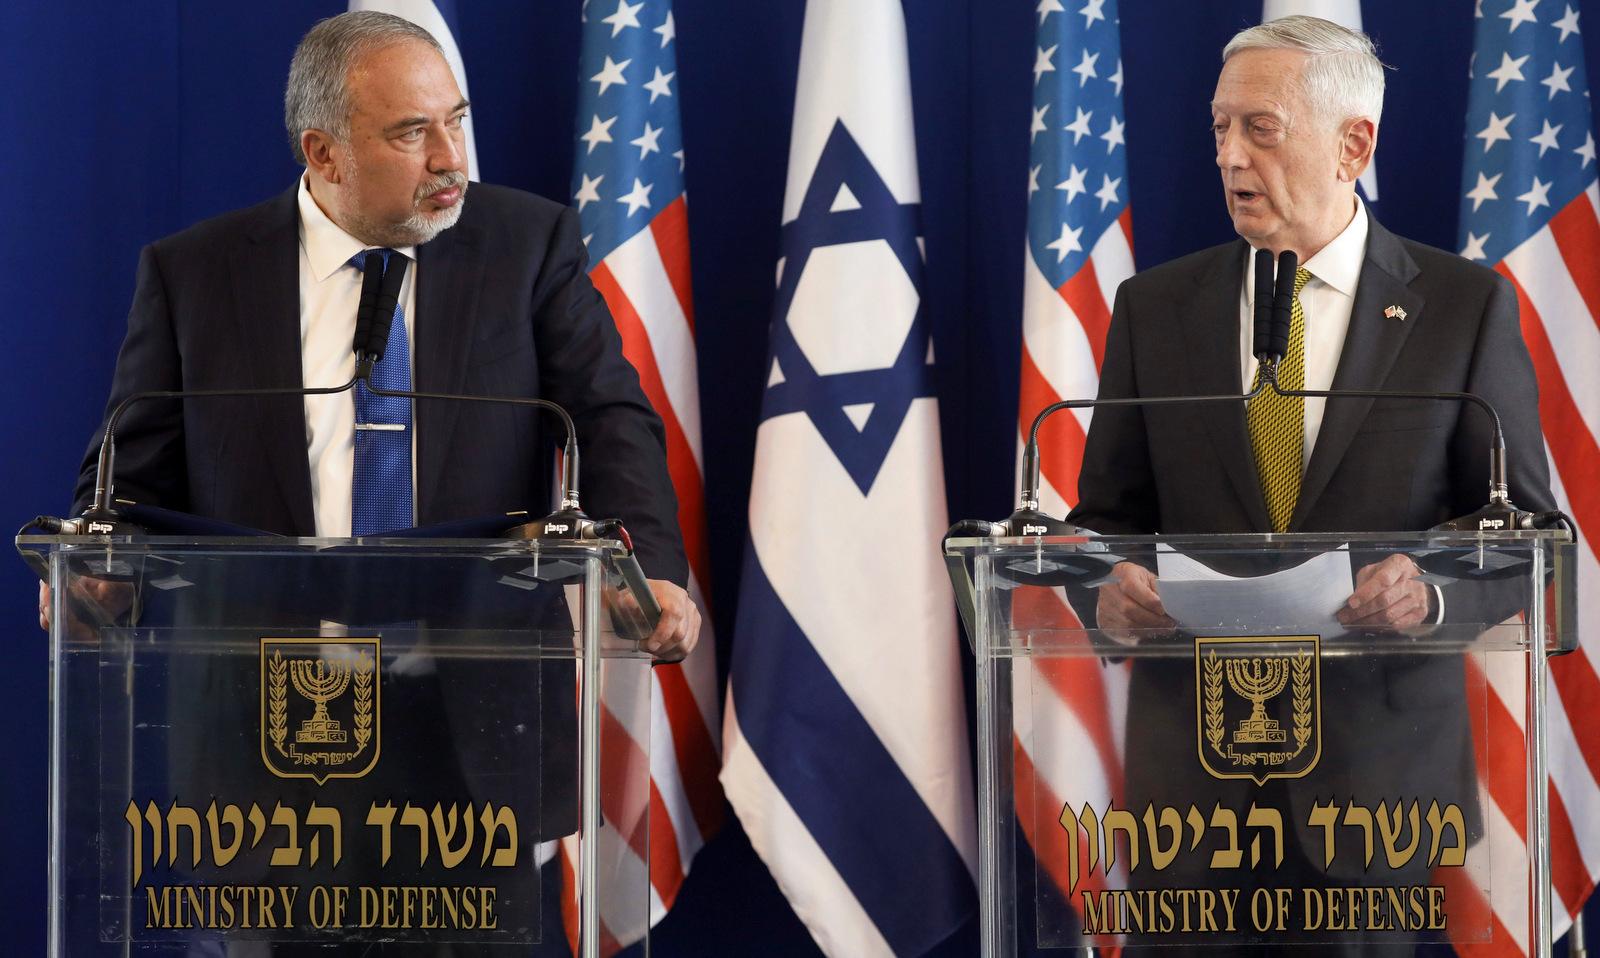 U.S. Defense Secretary Jim Mattis, right, and Israeli Defense Minister Avigdor Lieberman attend a joint press conference at the Defense Ministry in Tel Aviv, Israel, April 21, 2017. (Jonathan Ernst/AP)